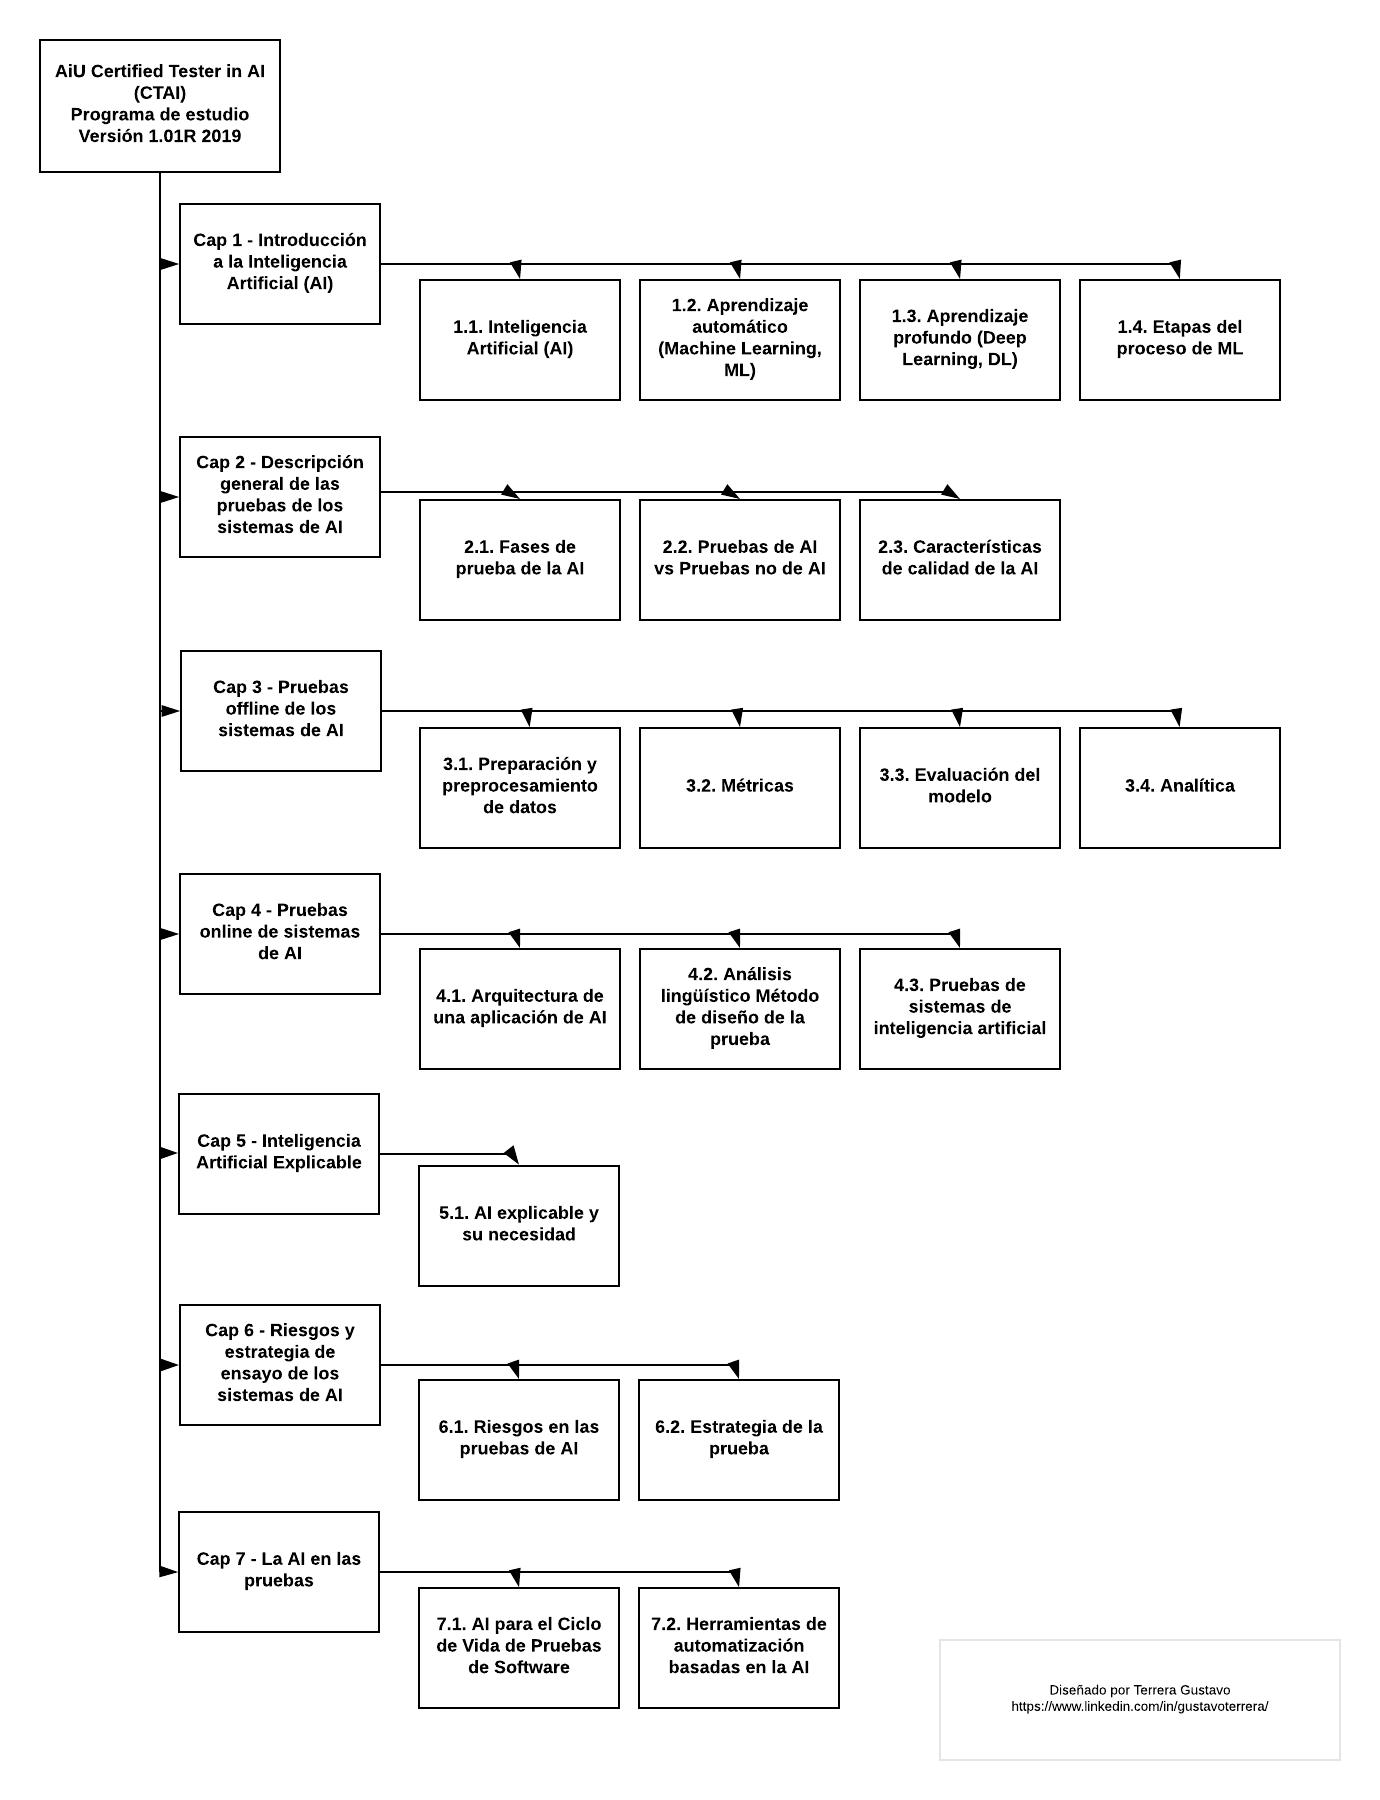 AiU Certified Tester in AI (CTAI) Programa de estudio – Mapa Mental